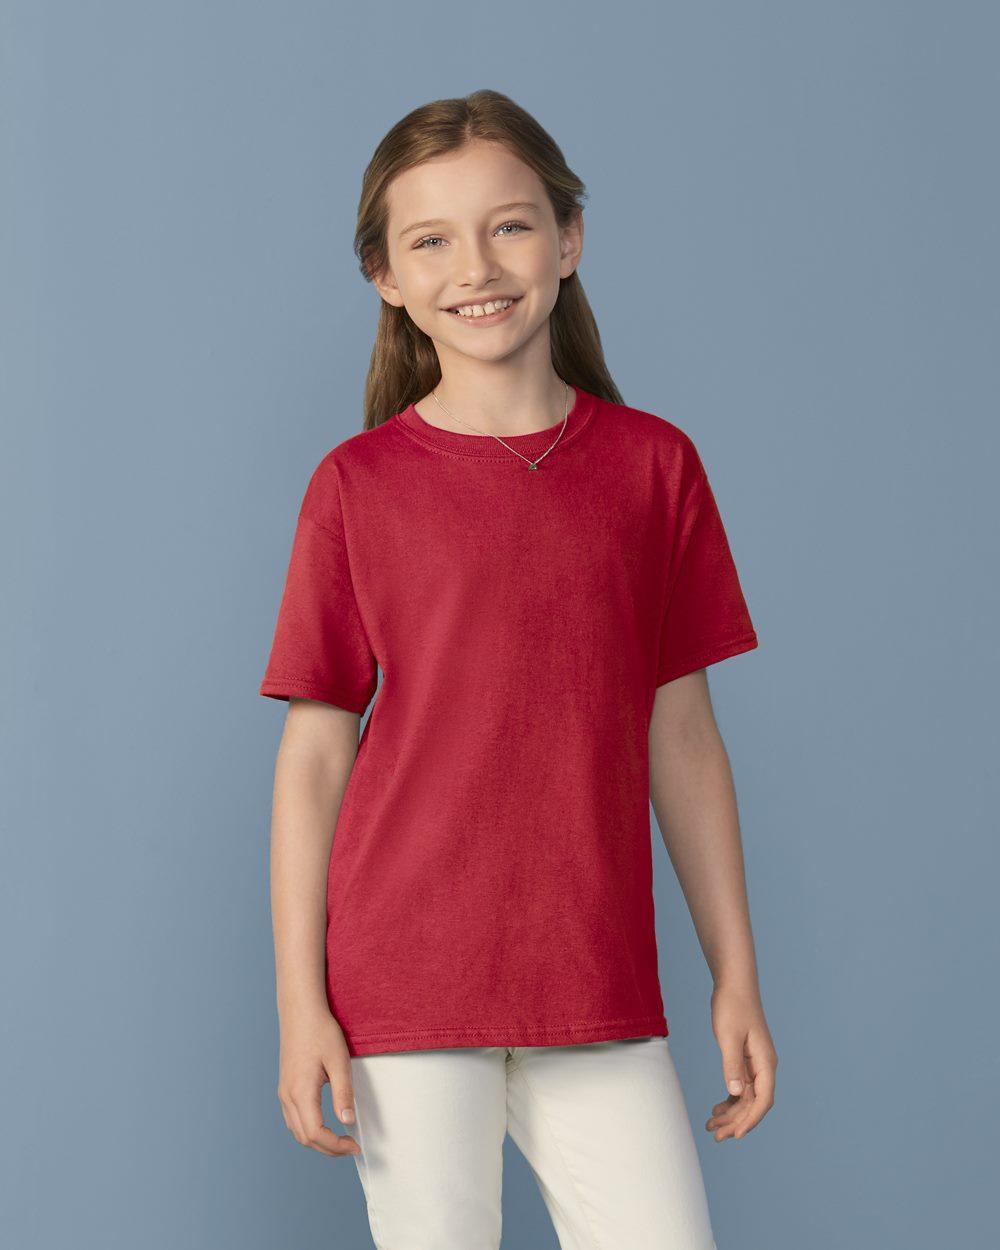 Gildan 64500b softstyle youth short sleeve t shirt for Kids t shirt printing